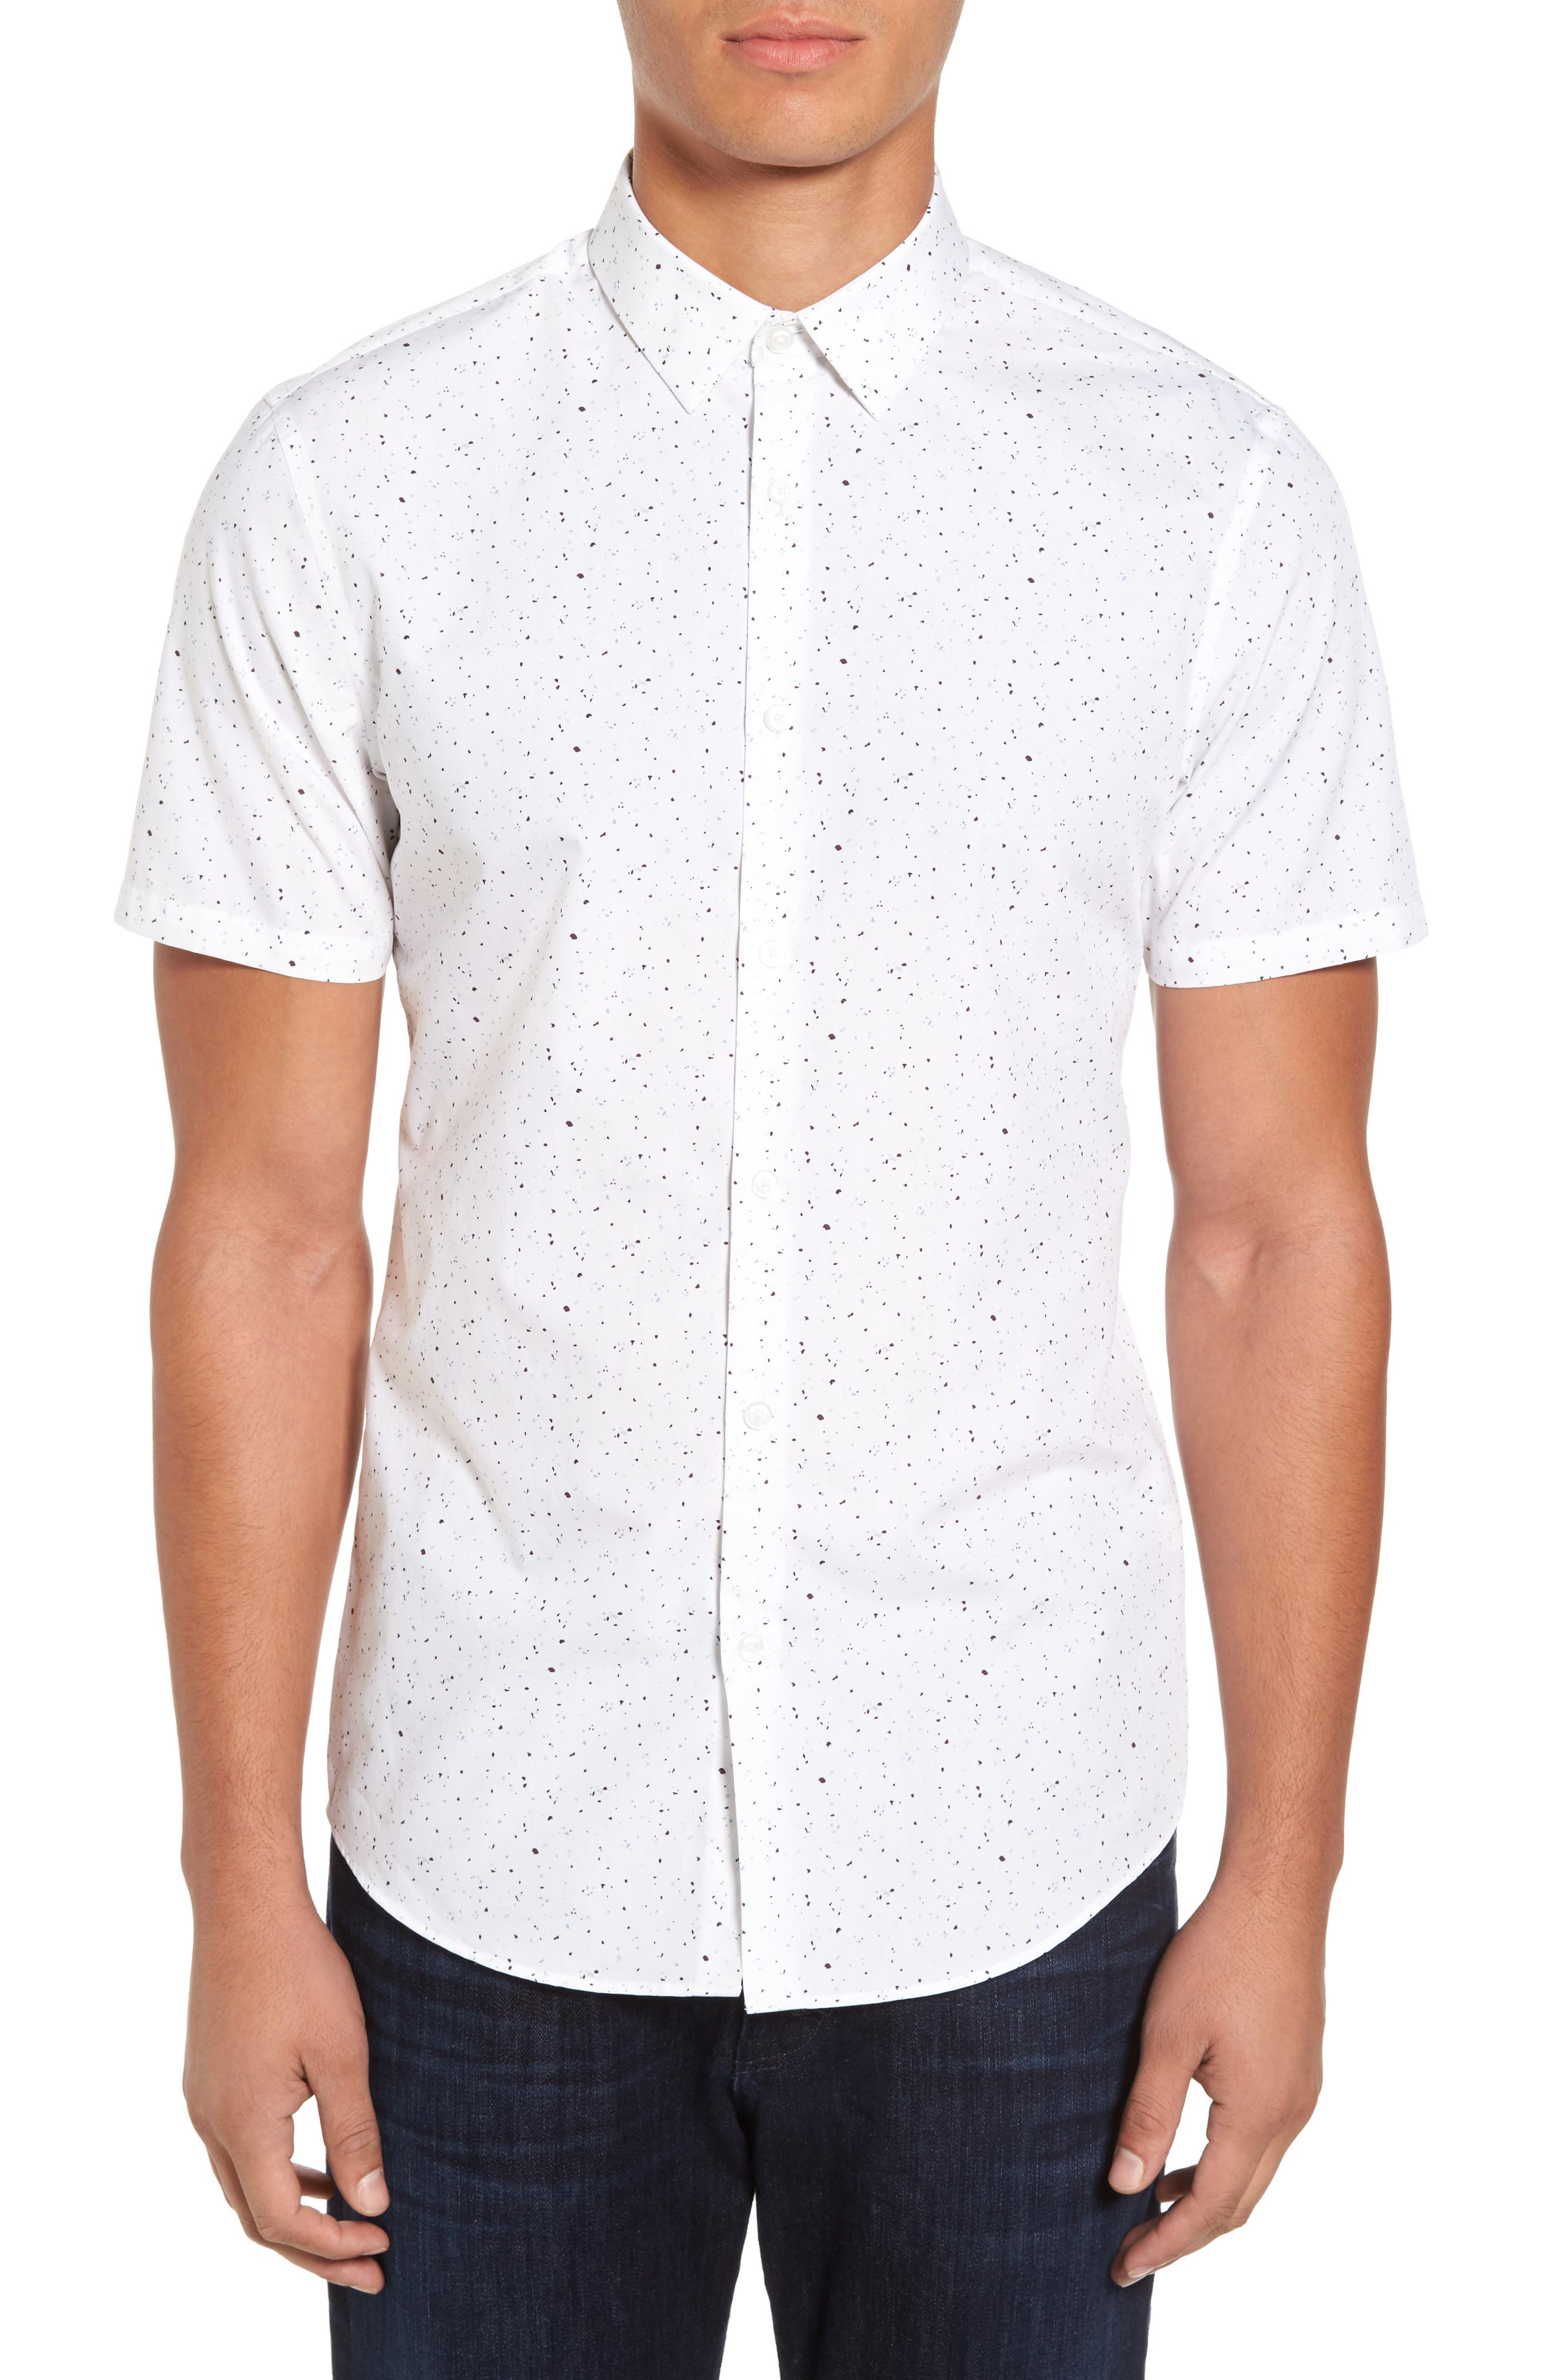 Speckle Print Sport Shirt,                         Main,                         color, White Plum Splatter Print